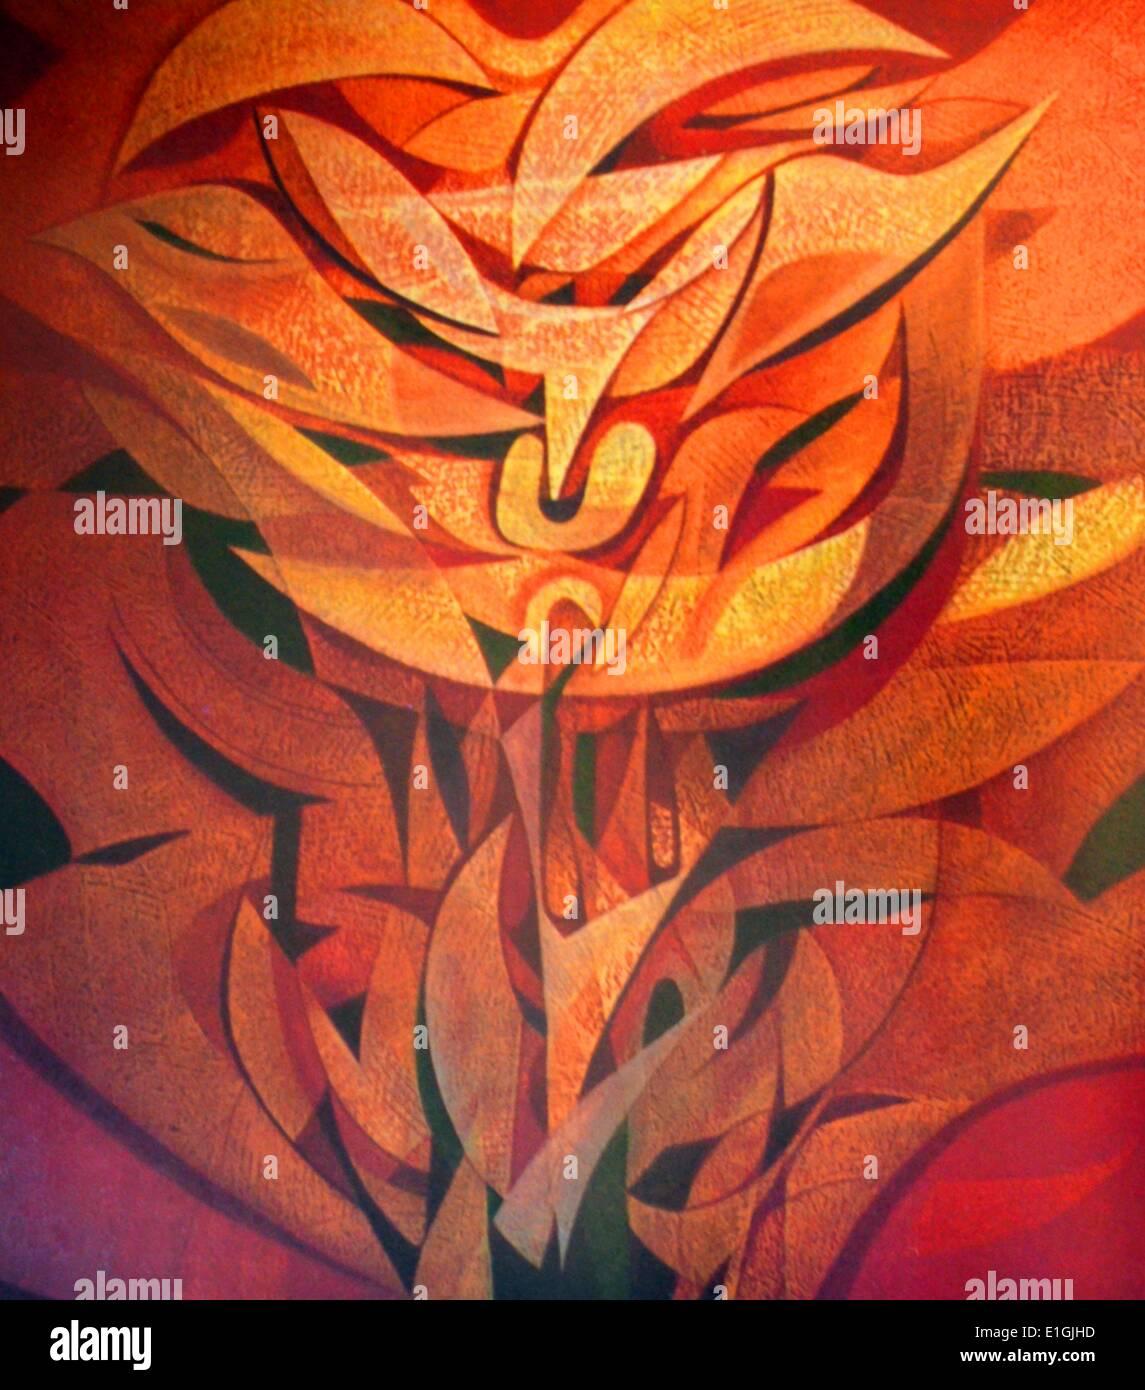 Romeo E Gutierrez, Wonders of Creation, 1995, Oil on canvas. - Stock Image